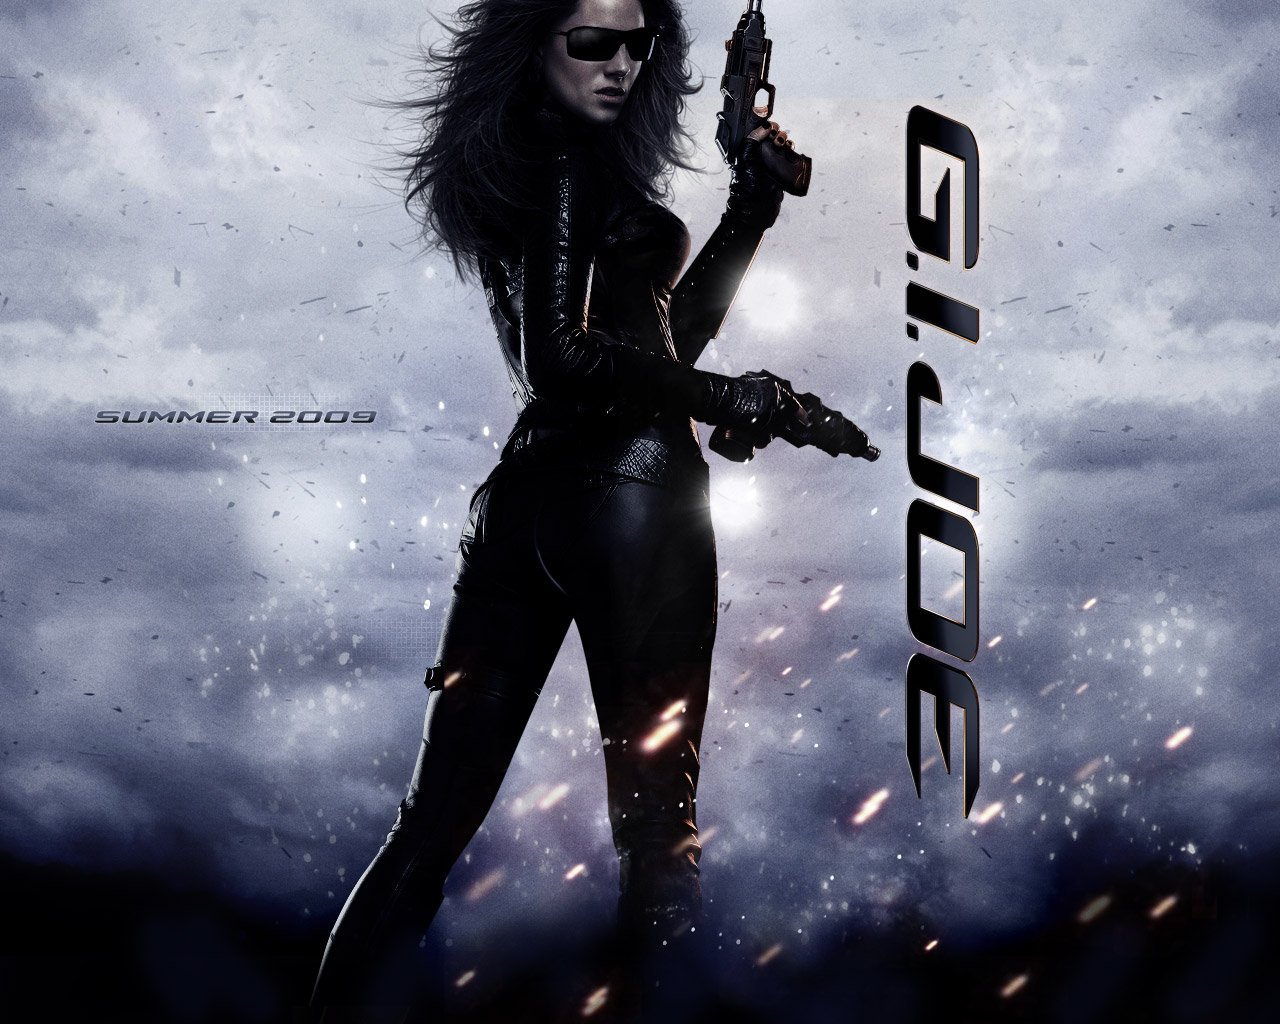 G.I. Joe: The Rise of Cobra 2009 movie